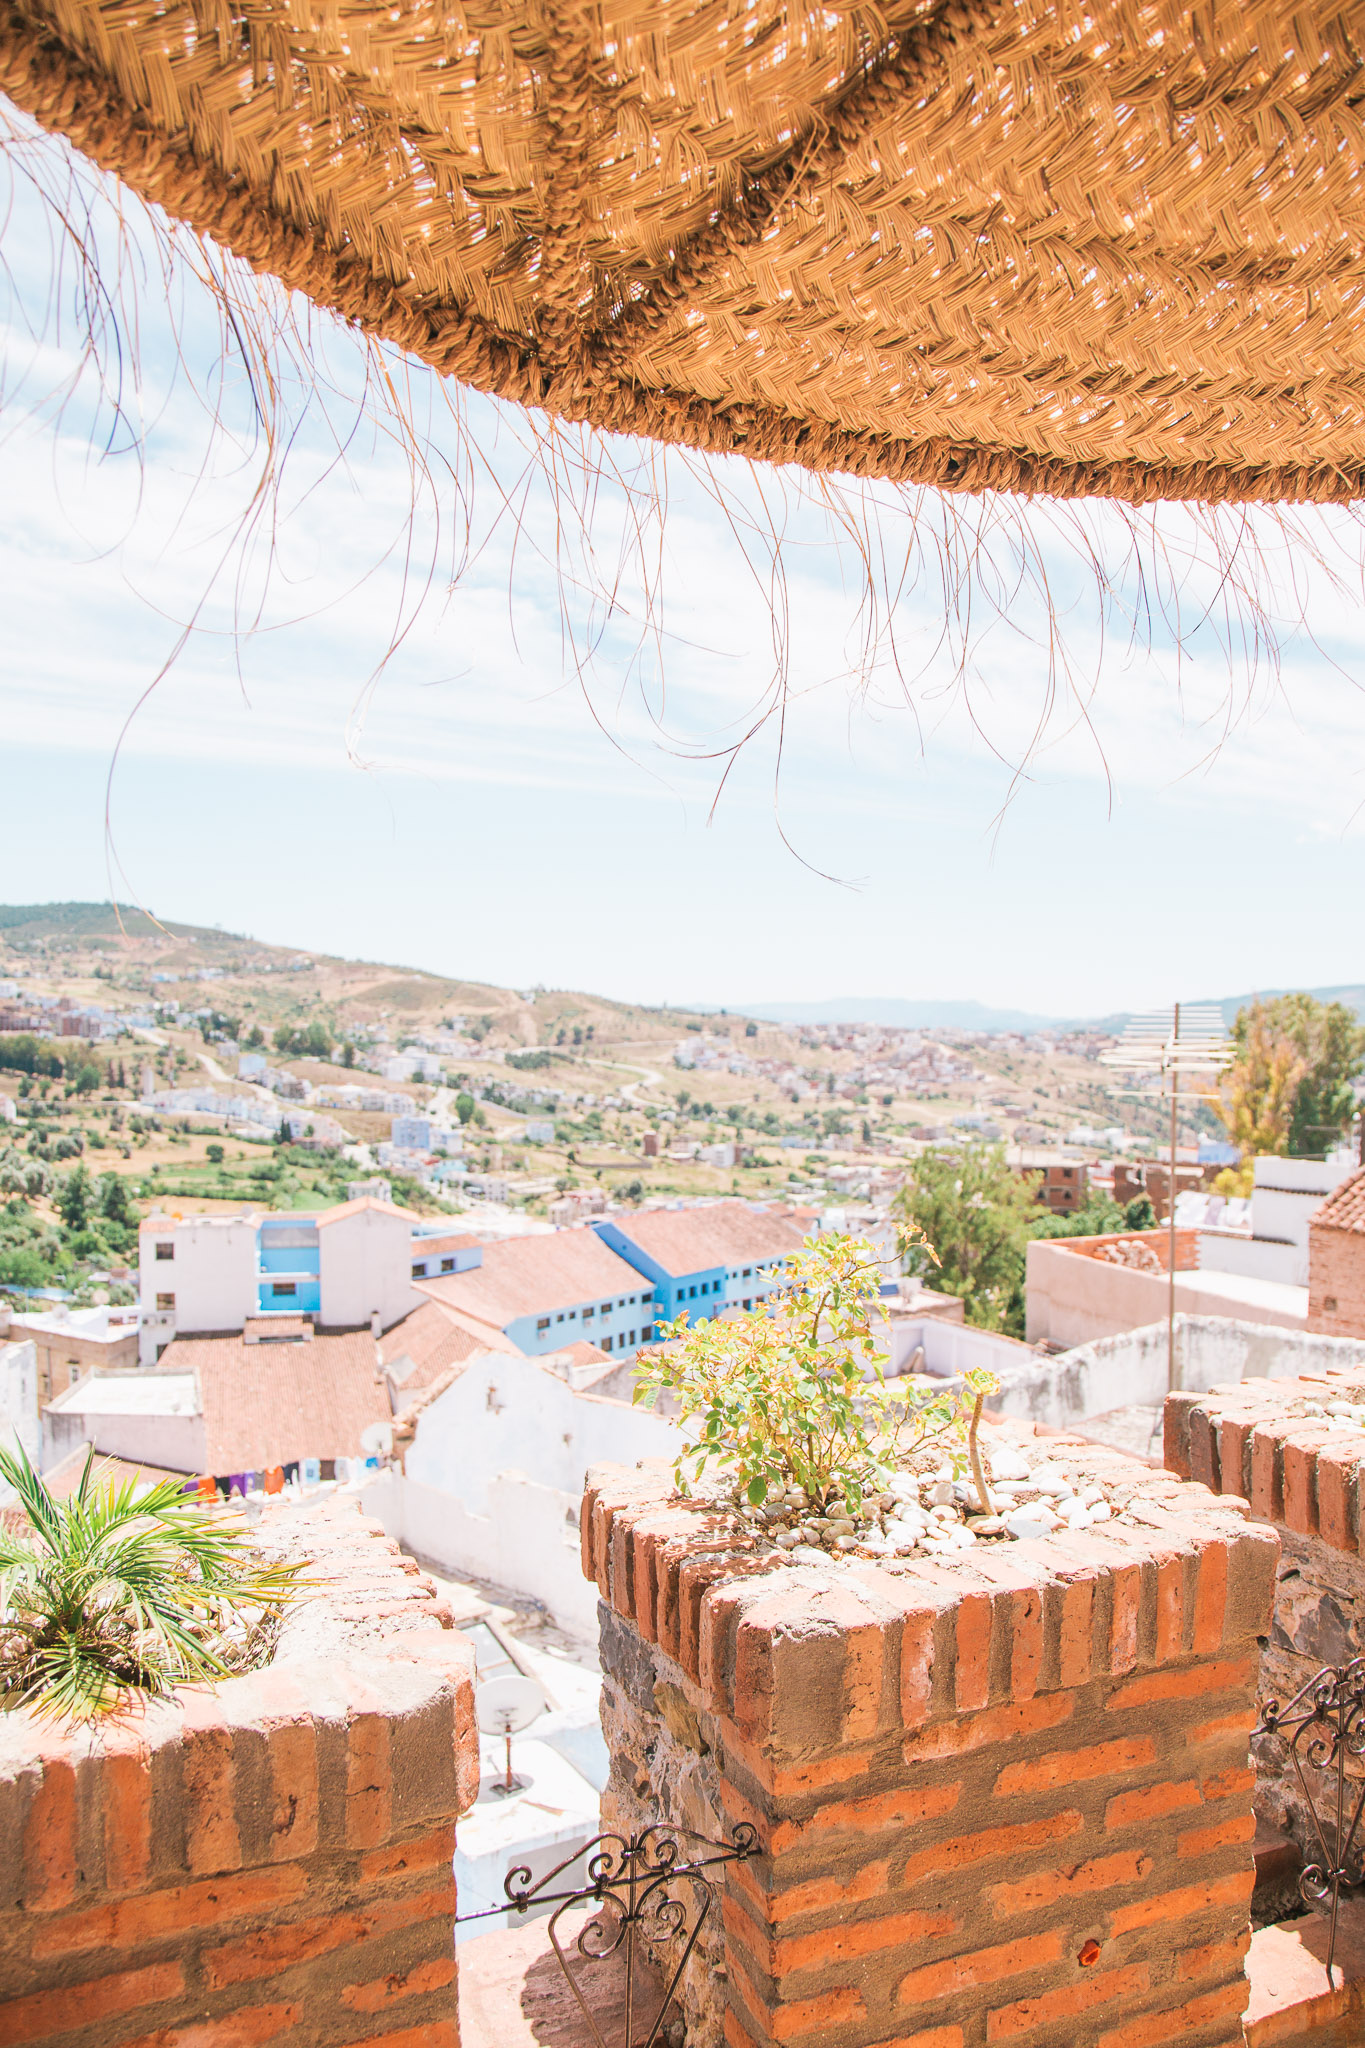 morocco-chefchaouen-blue-city-1.jpg